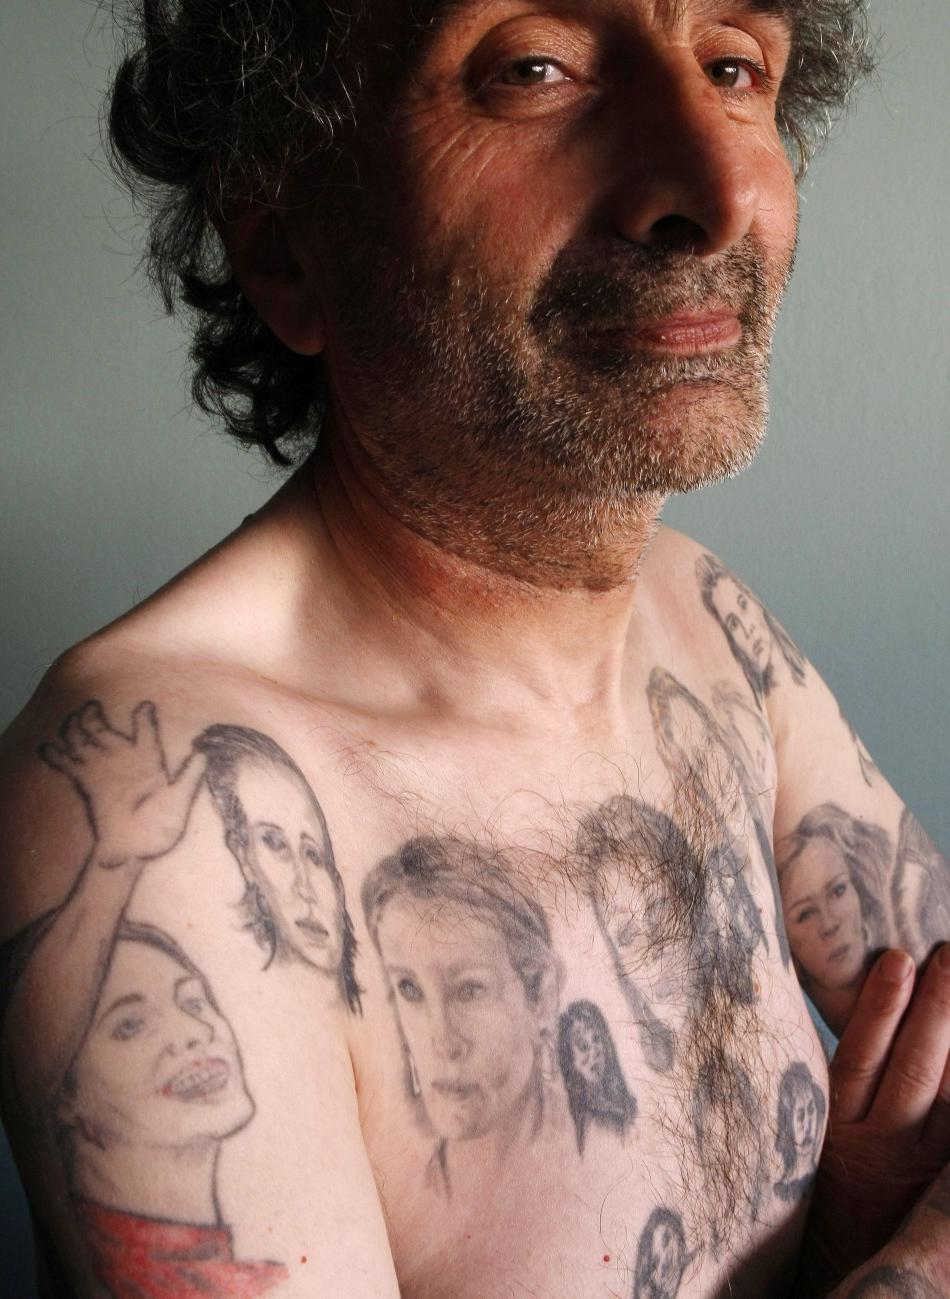 Tattoo Tuesdays: 25 Tattoos Of